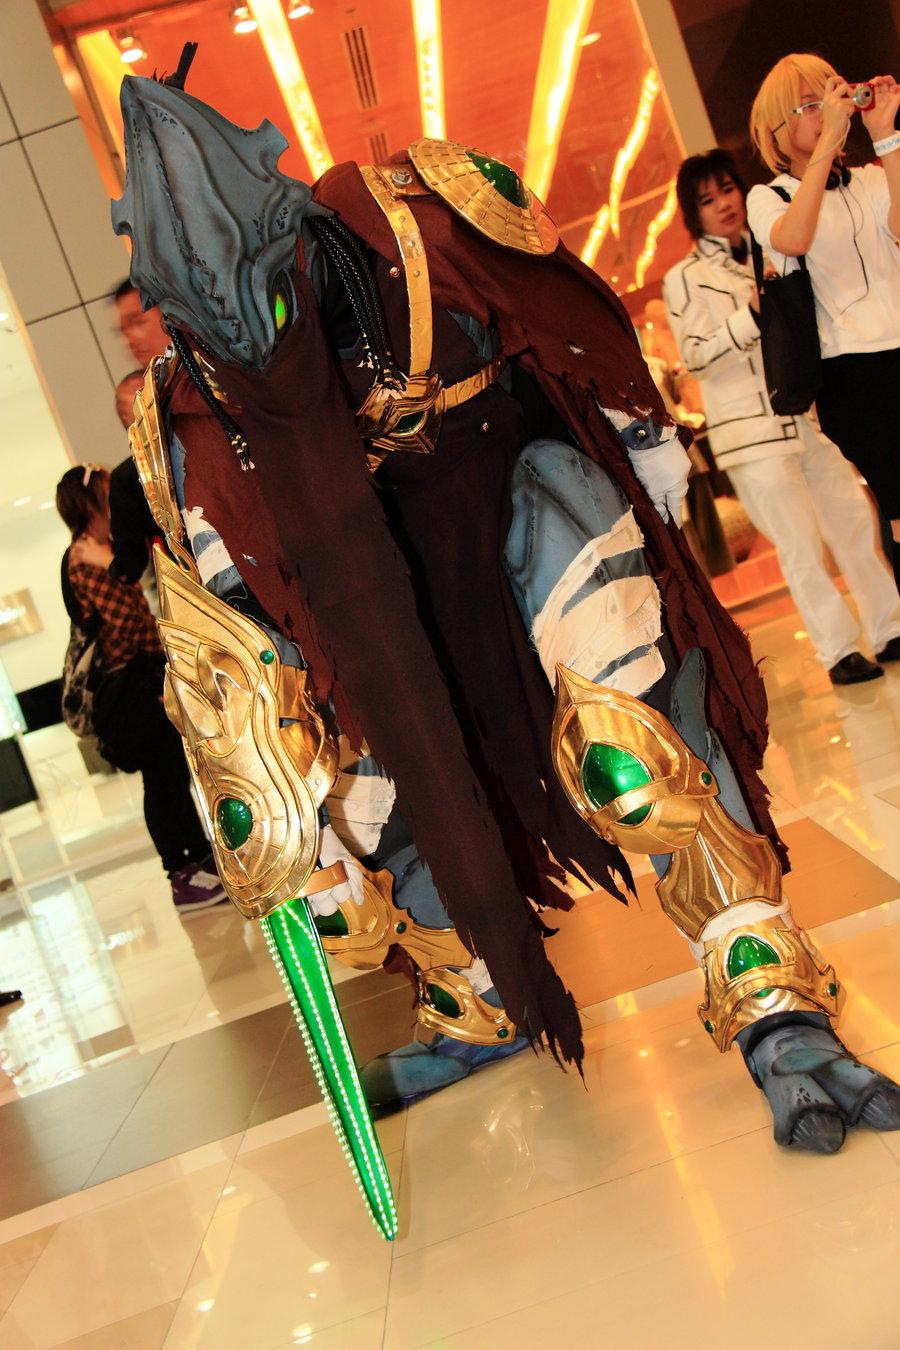 my_zeratul_cosplay_by_darkgodmaru-d3d9agw